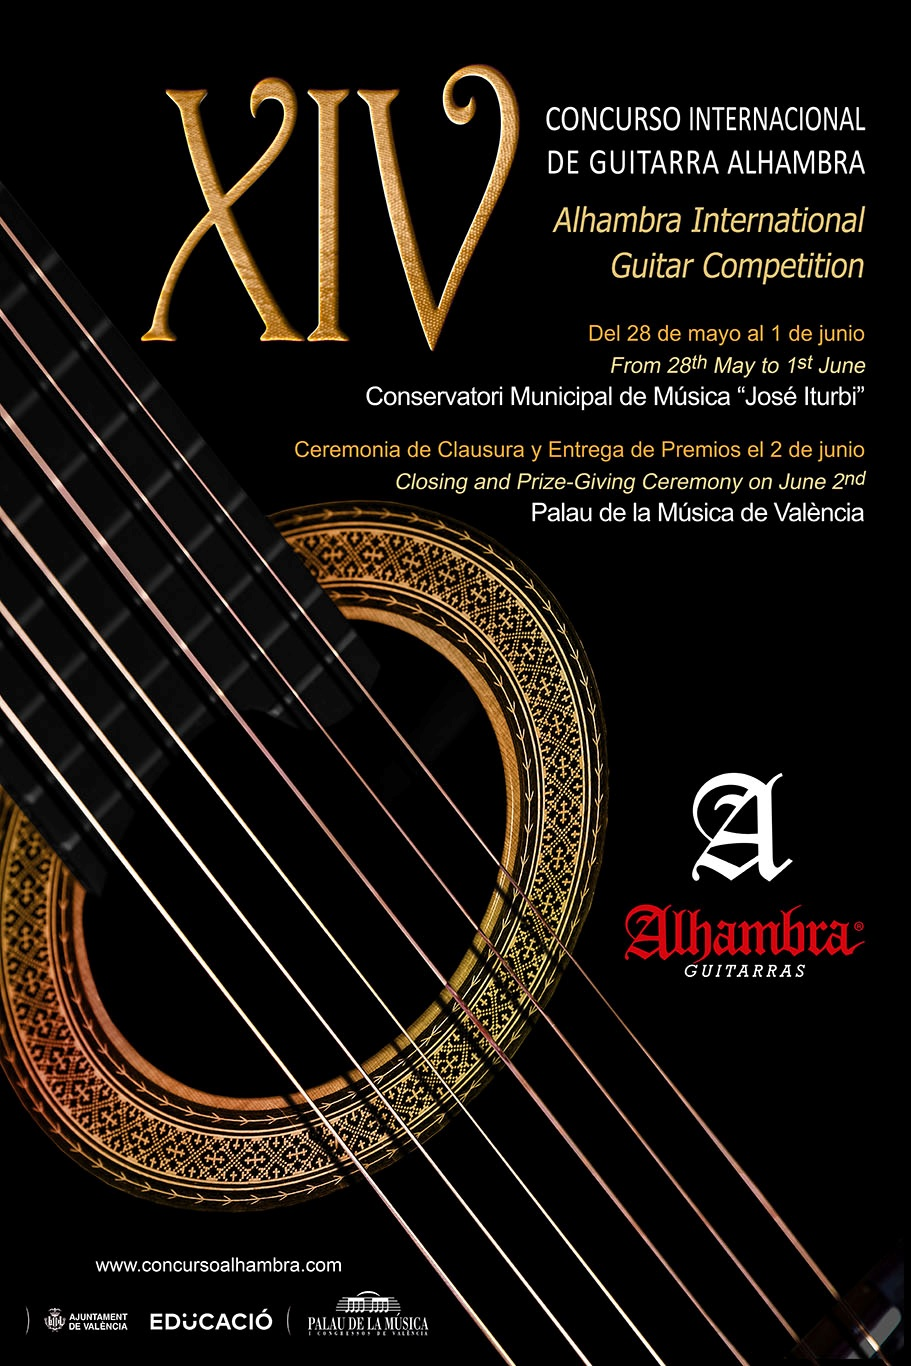 Concurso Alhambra 2018, Guitarras Alhambra